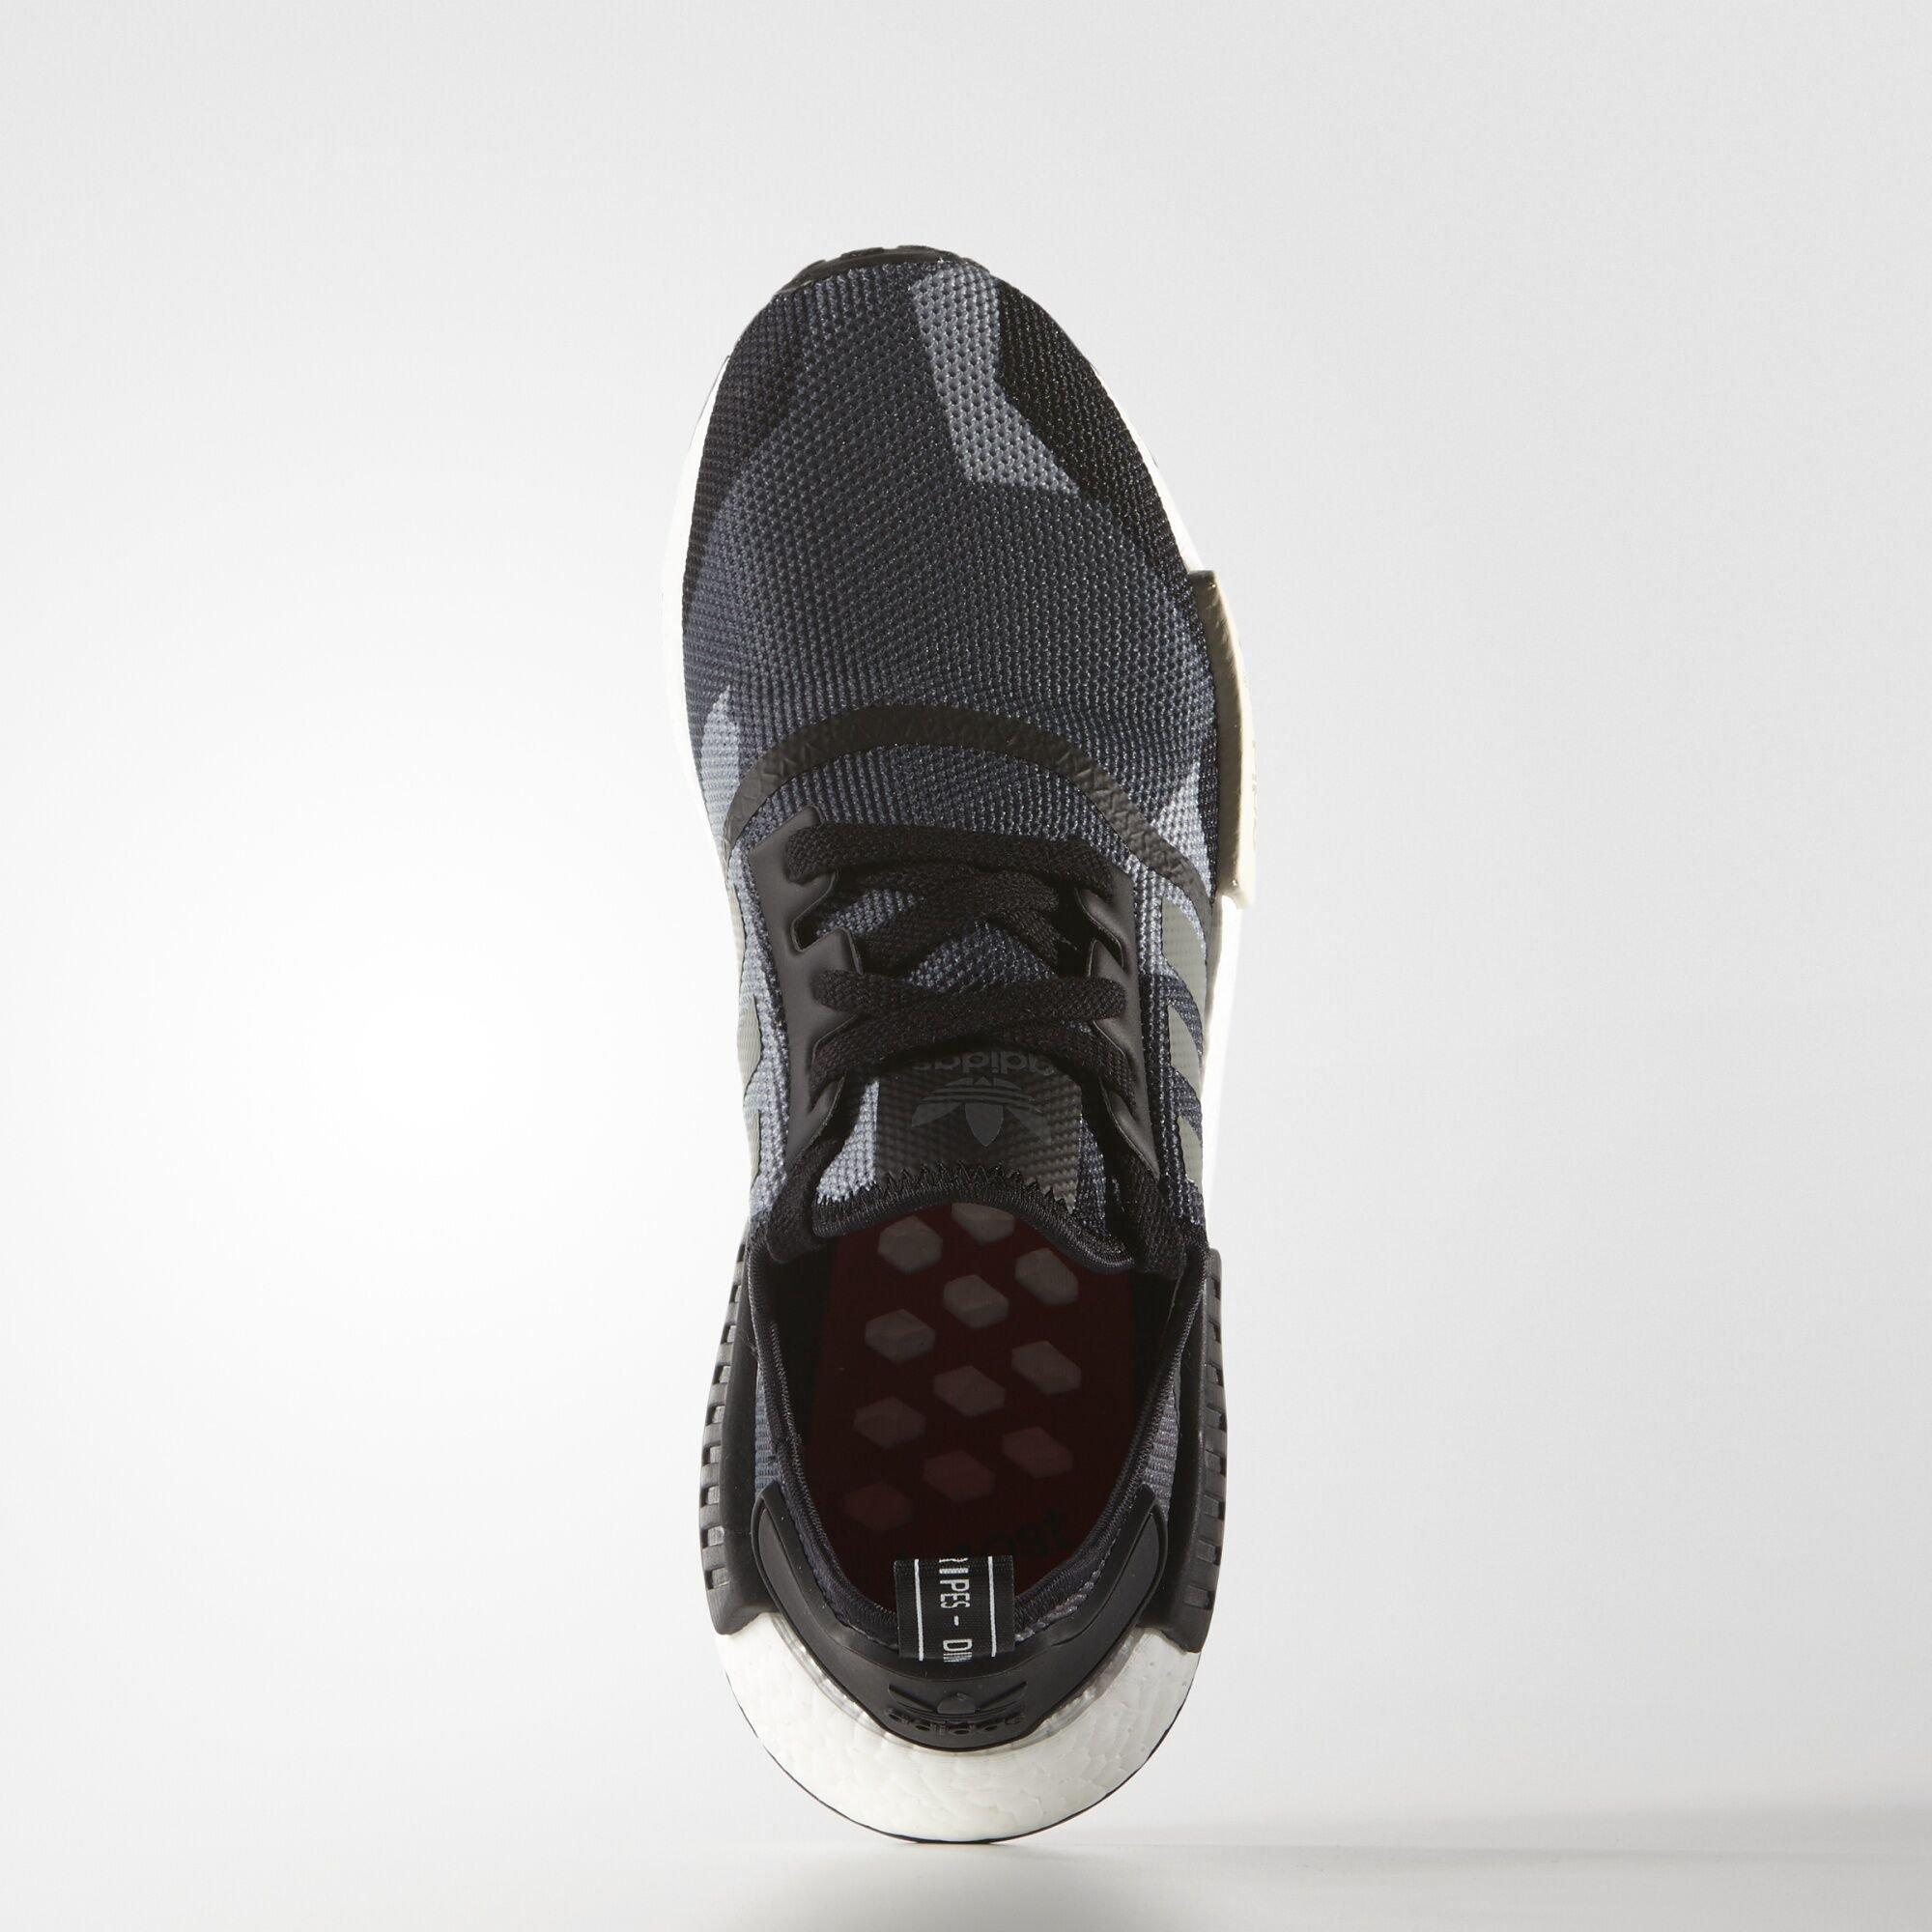 adidas NMD R1 Geometric Black Camo (S79163)